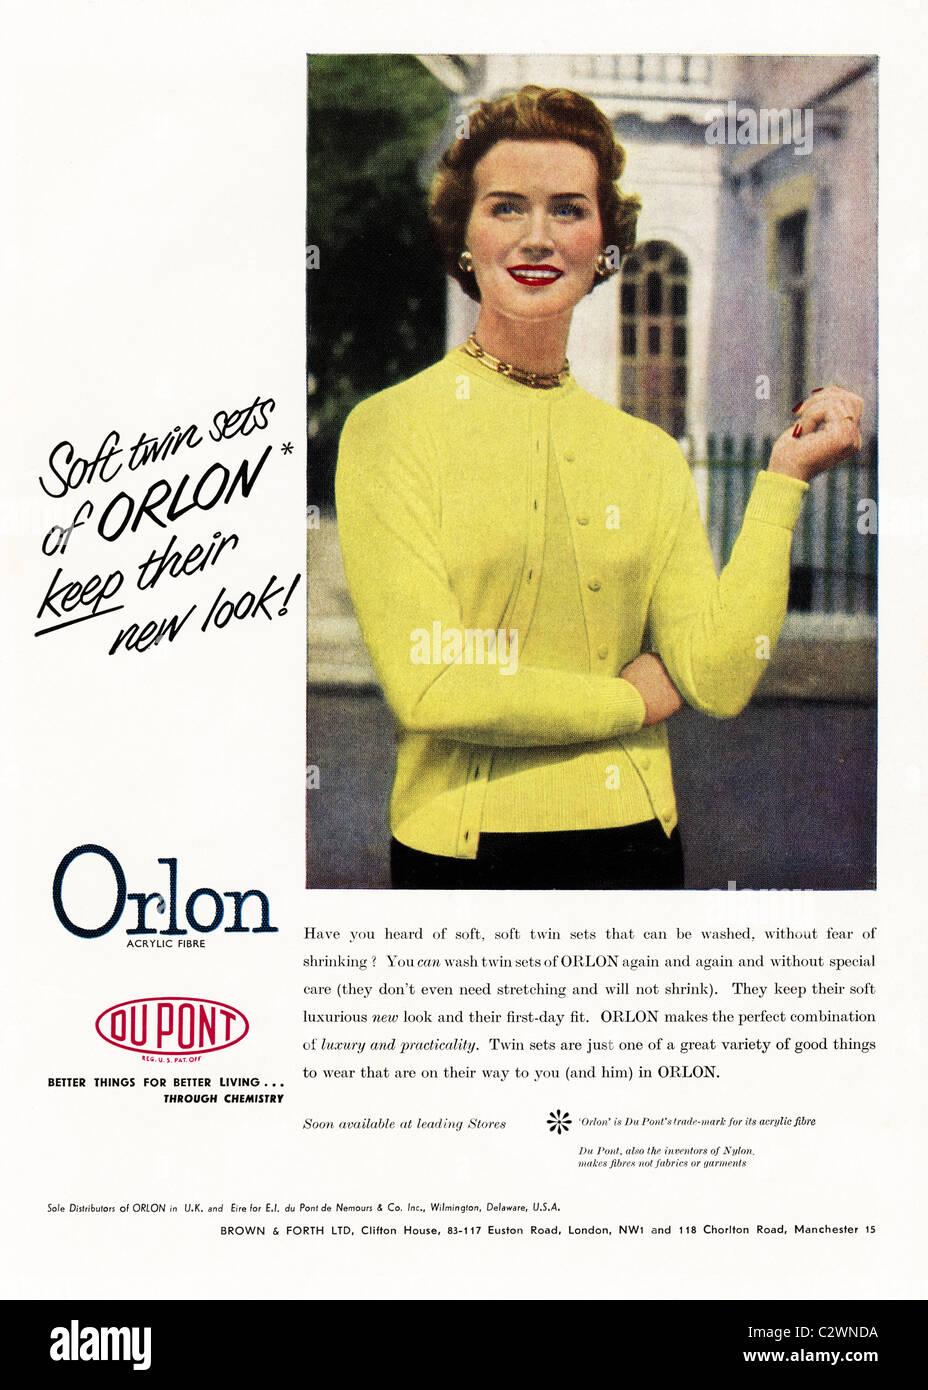 Full page colour advertisement in fashion magazine circa 1950s for ORLON acrylic fibre by DU PONT - Stock Image